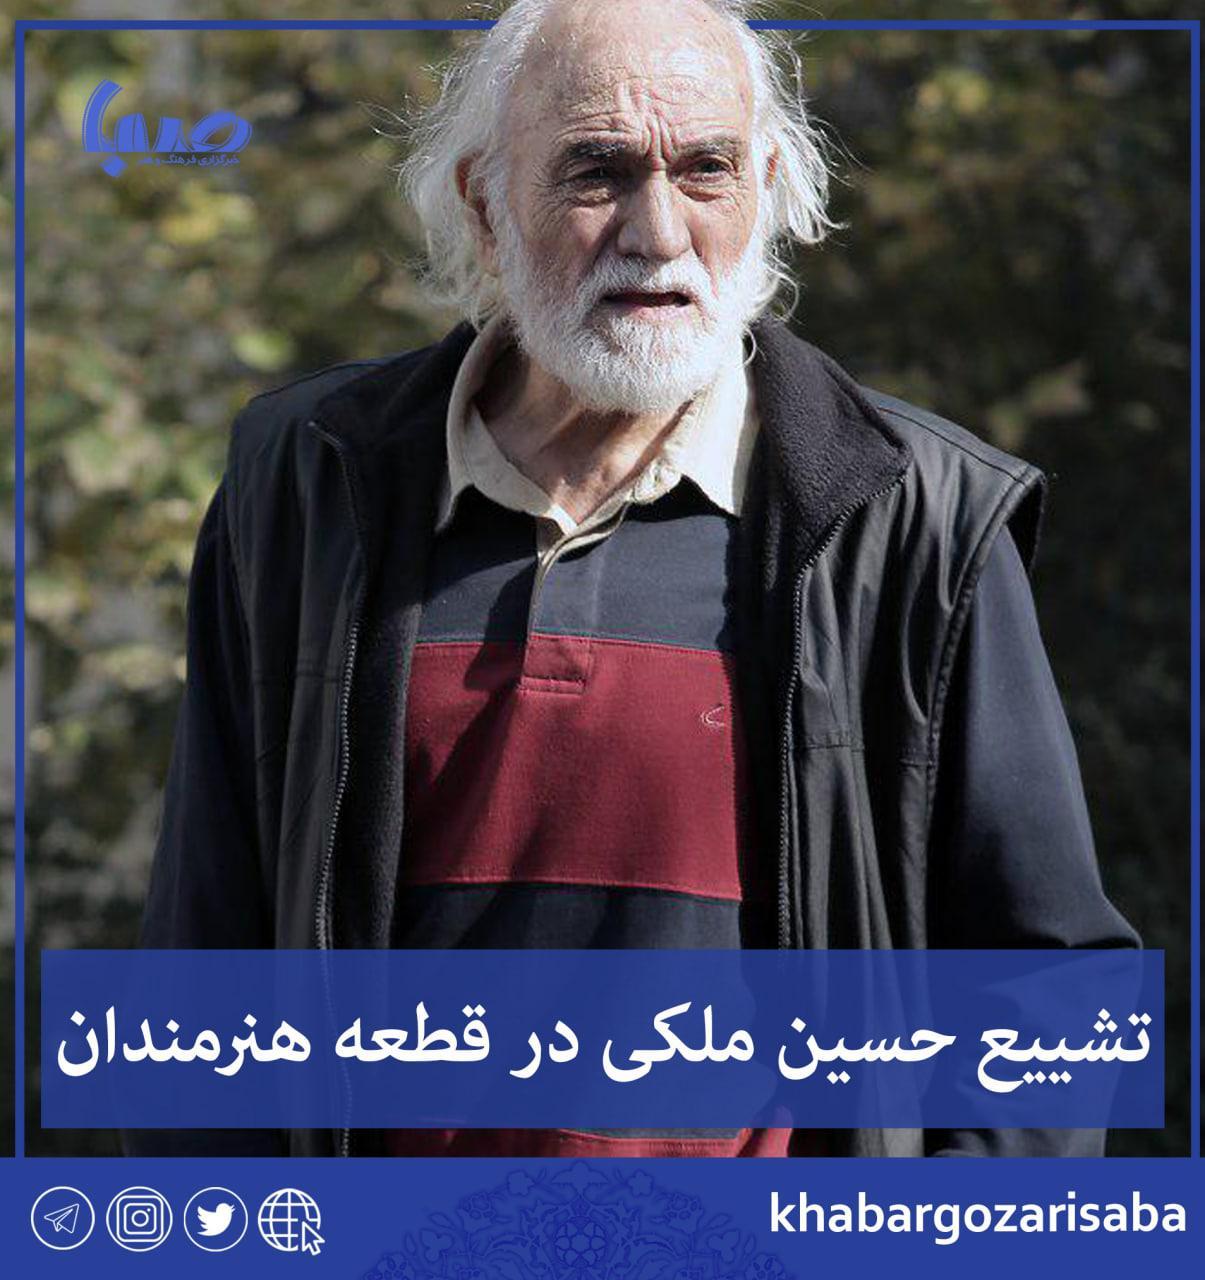 حسین ملکی